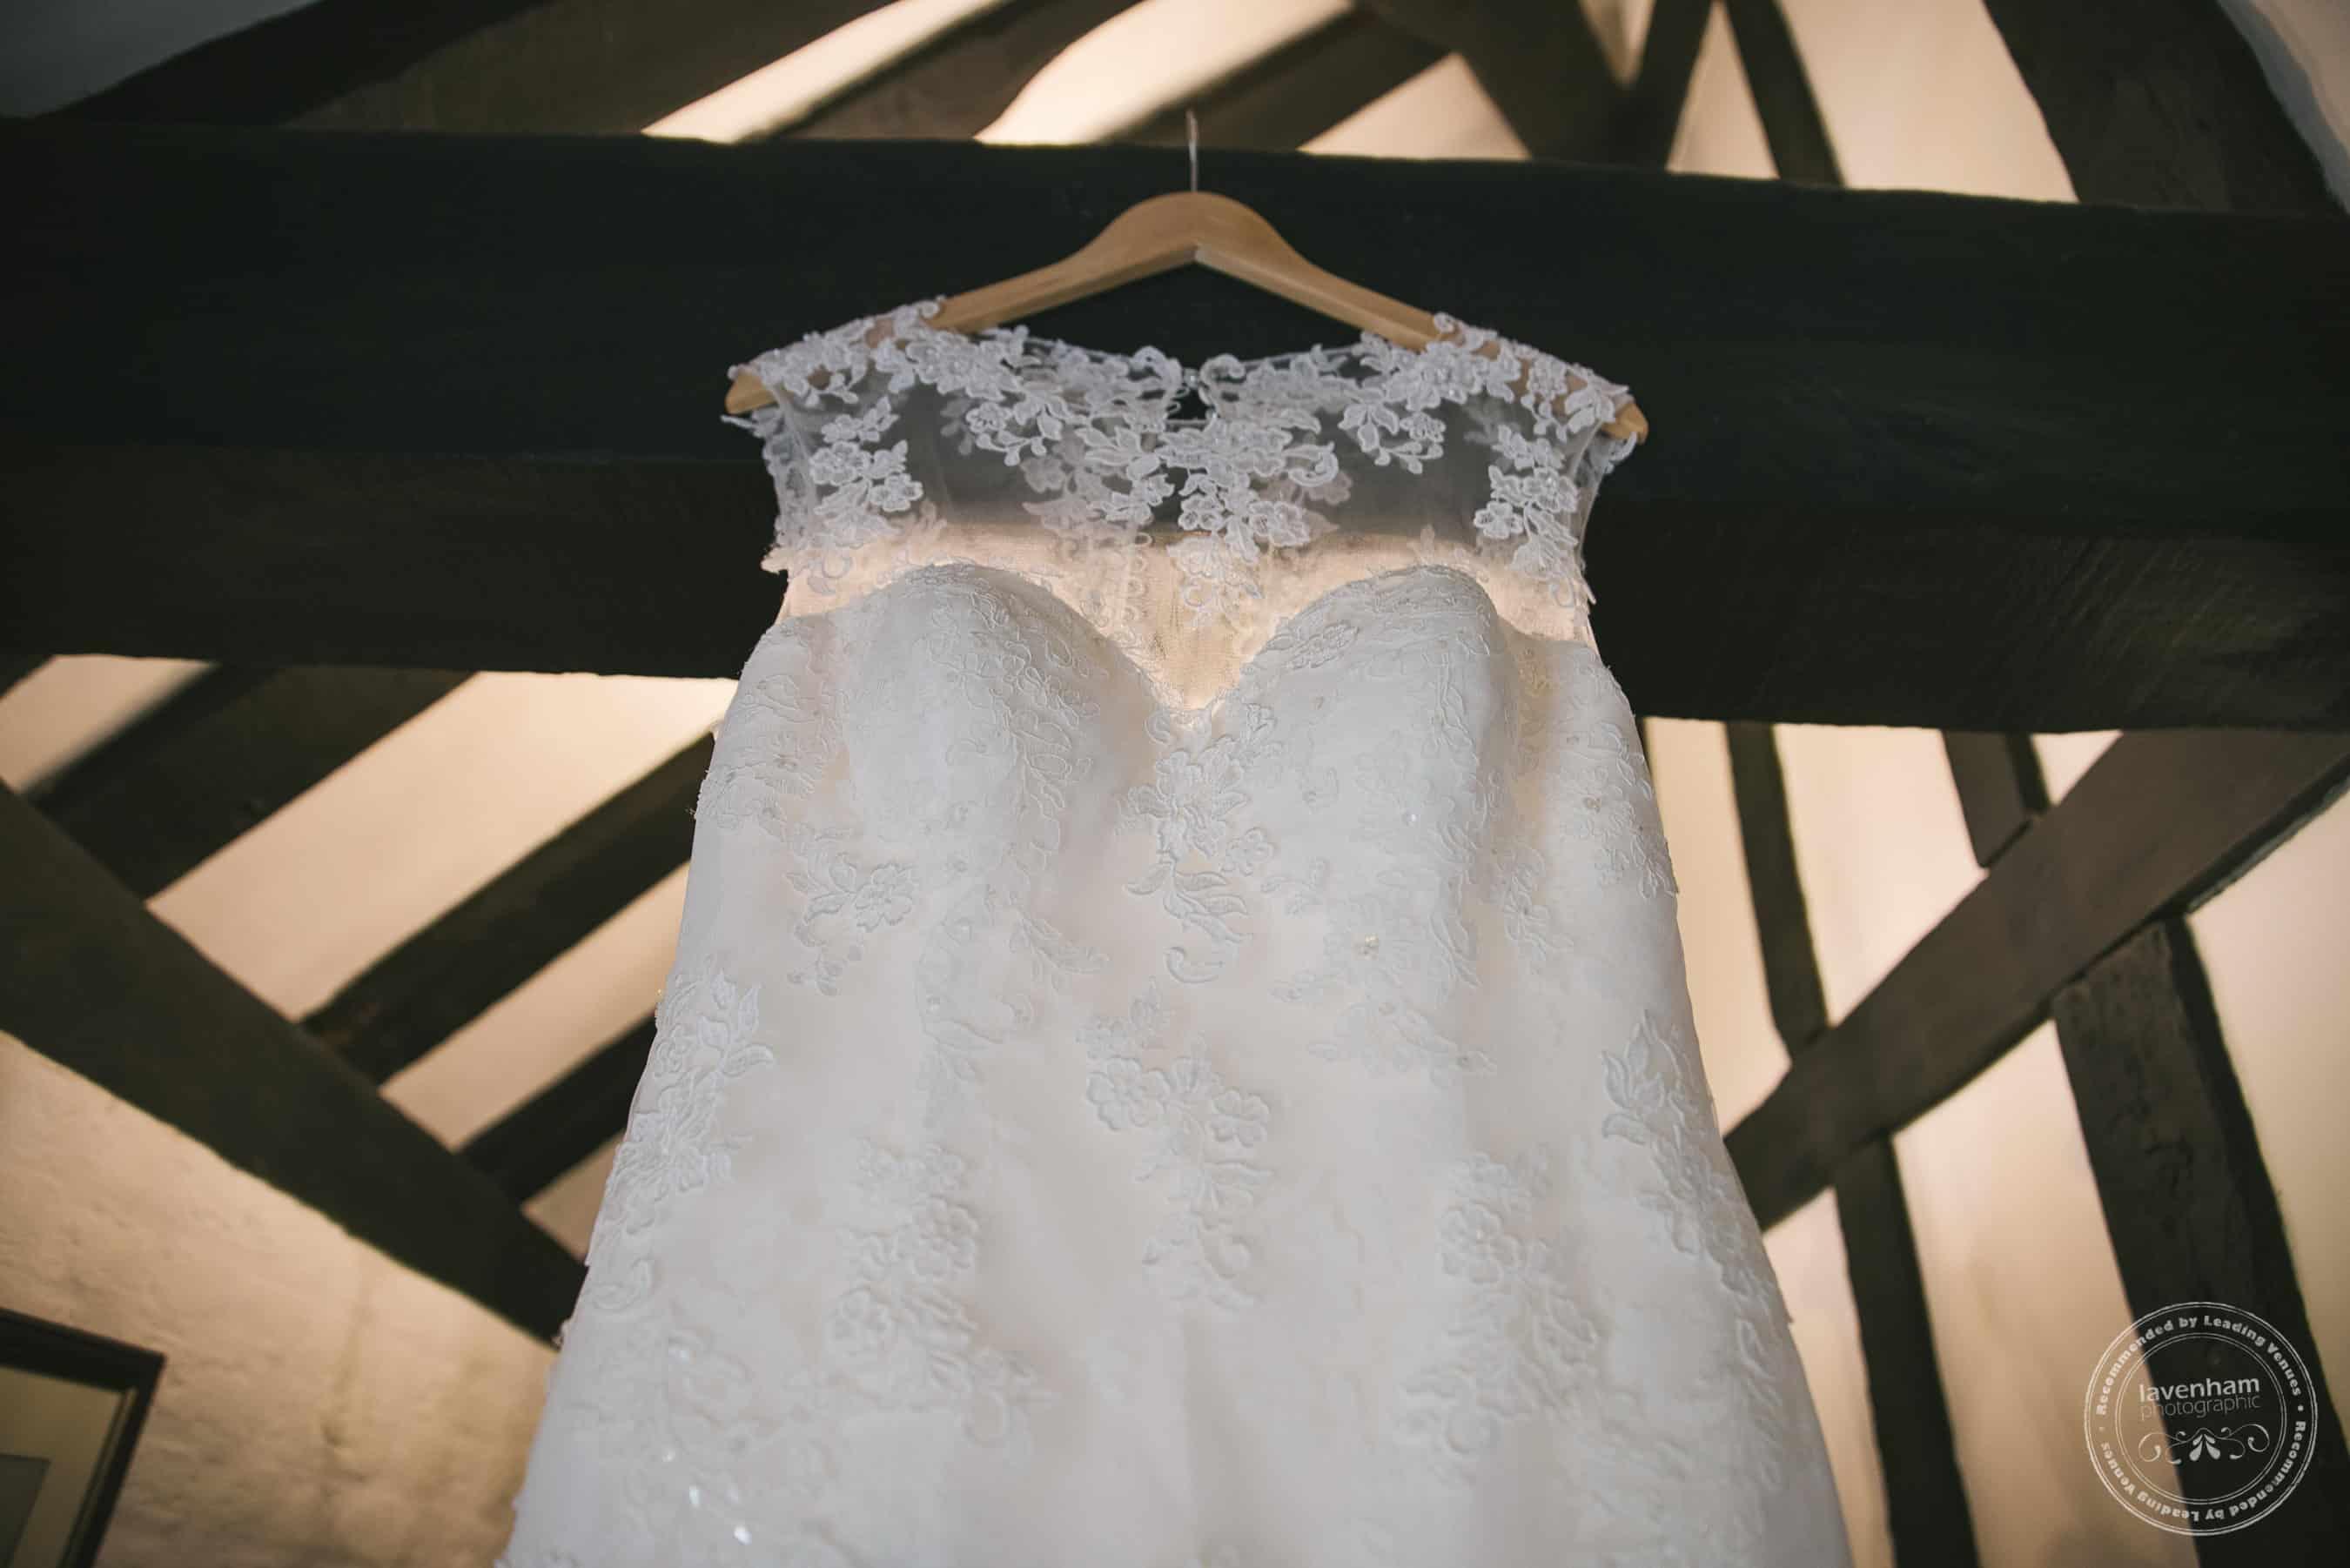 251118 Leez Priory Wedding Photography by Lavenham Photographic 007